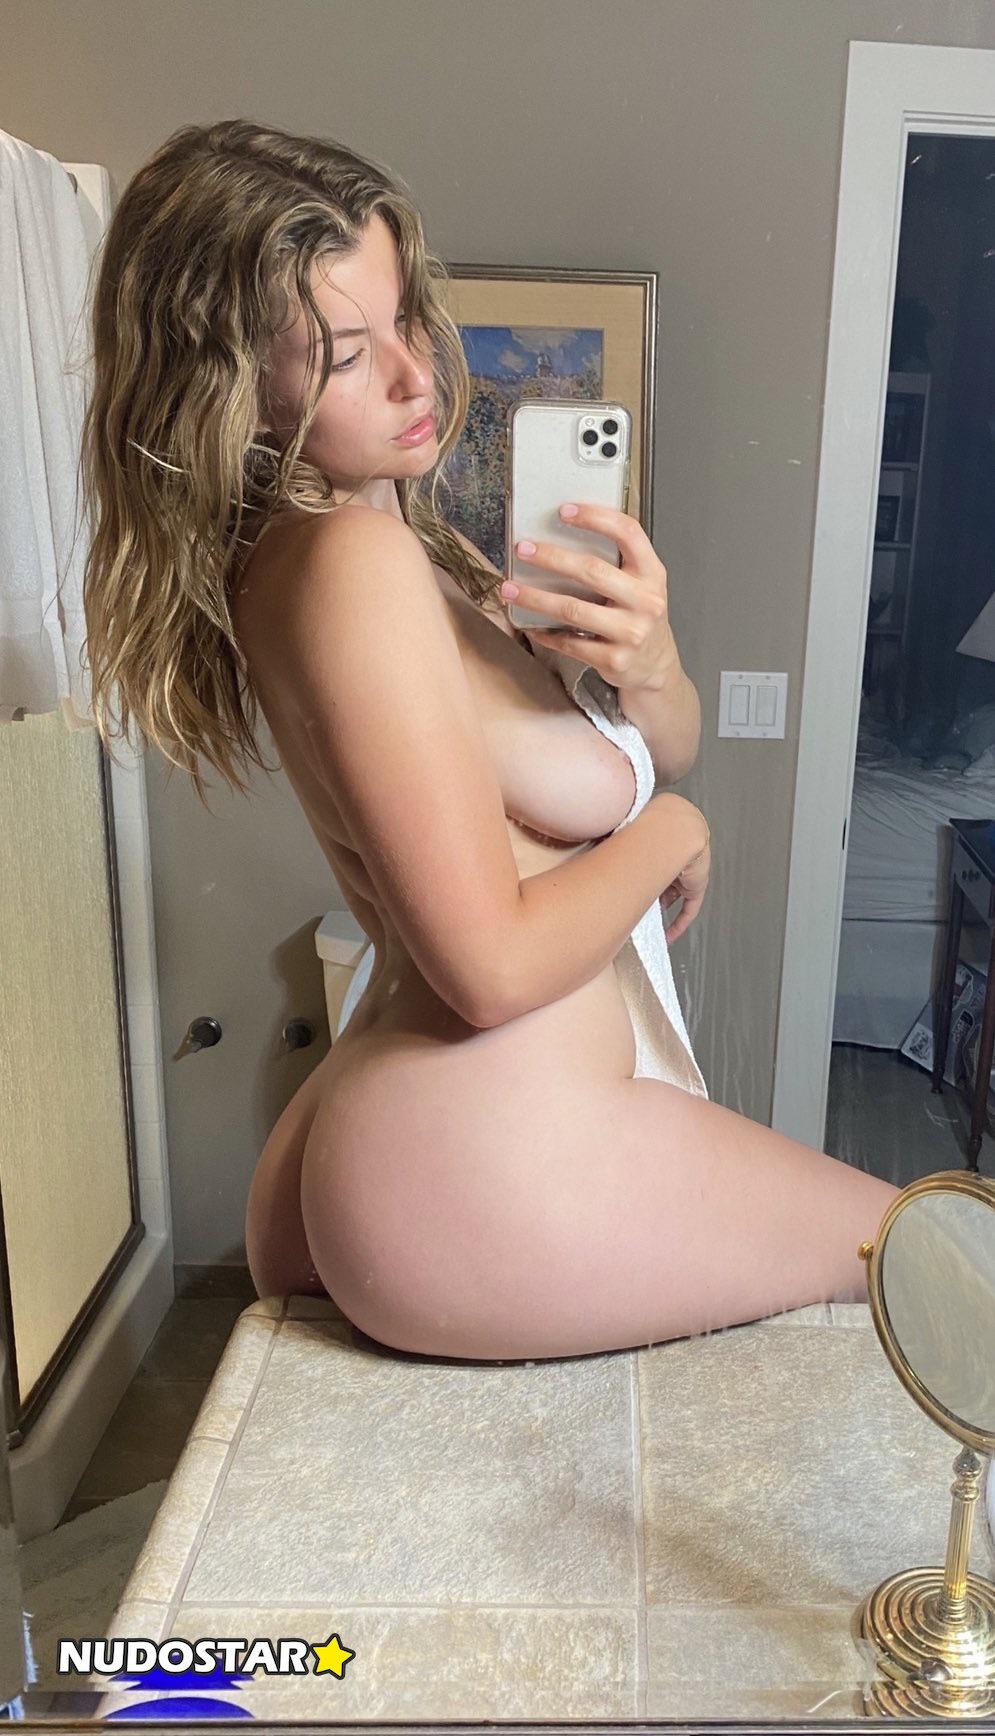 Mia Melano Miamelano777 Onlyfans Nude Leaks 0026